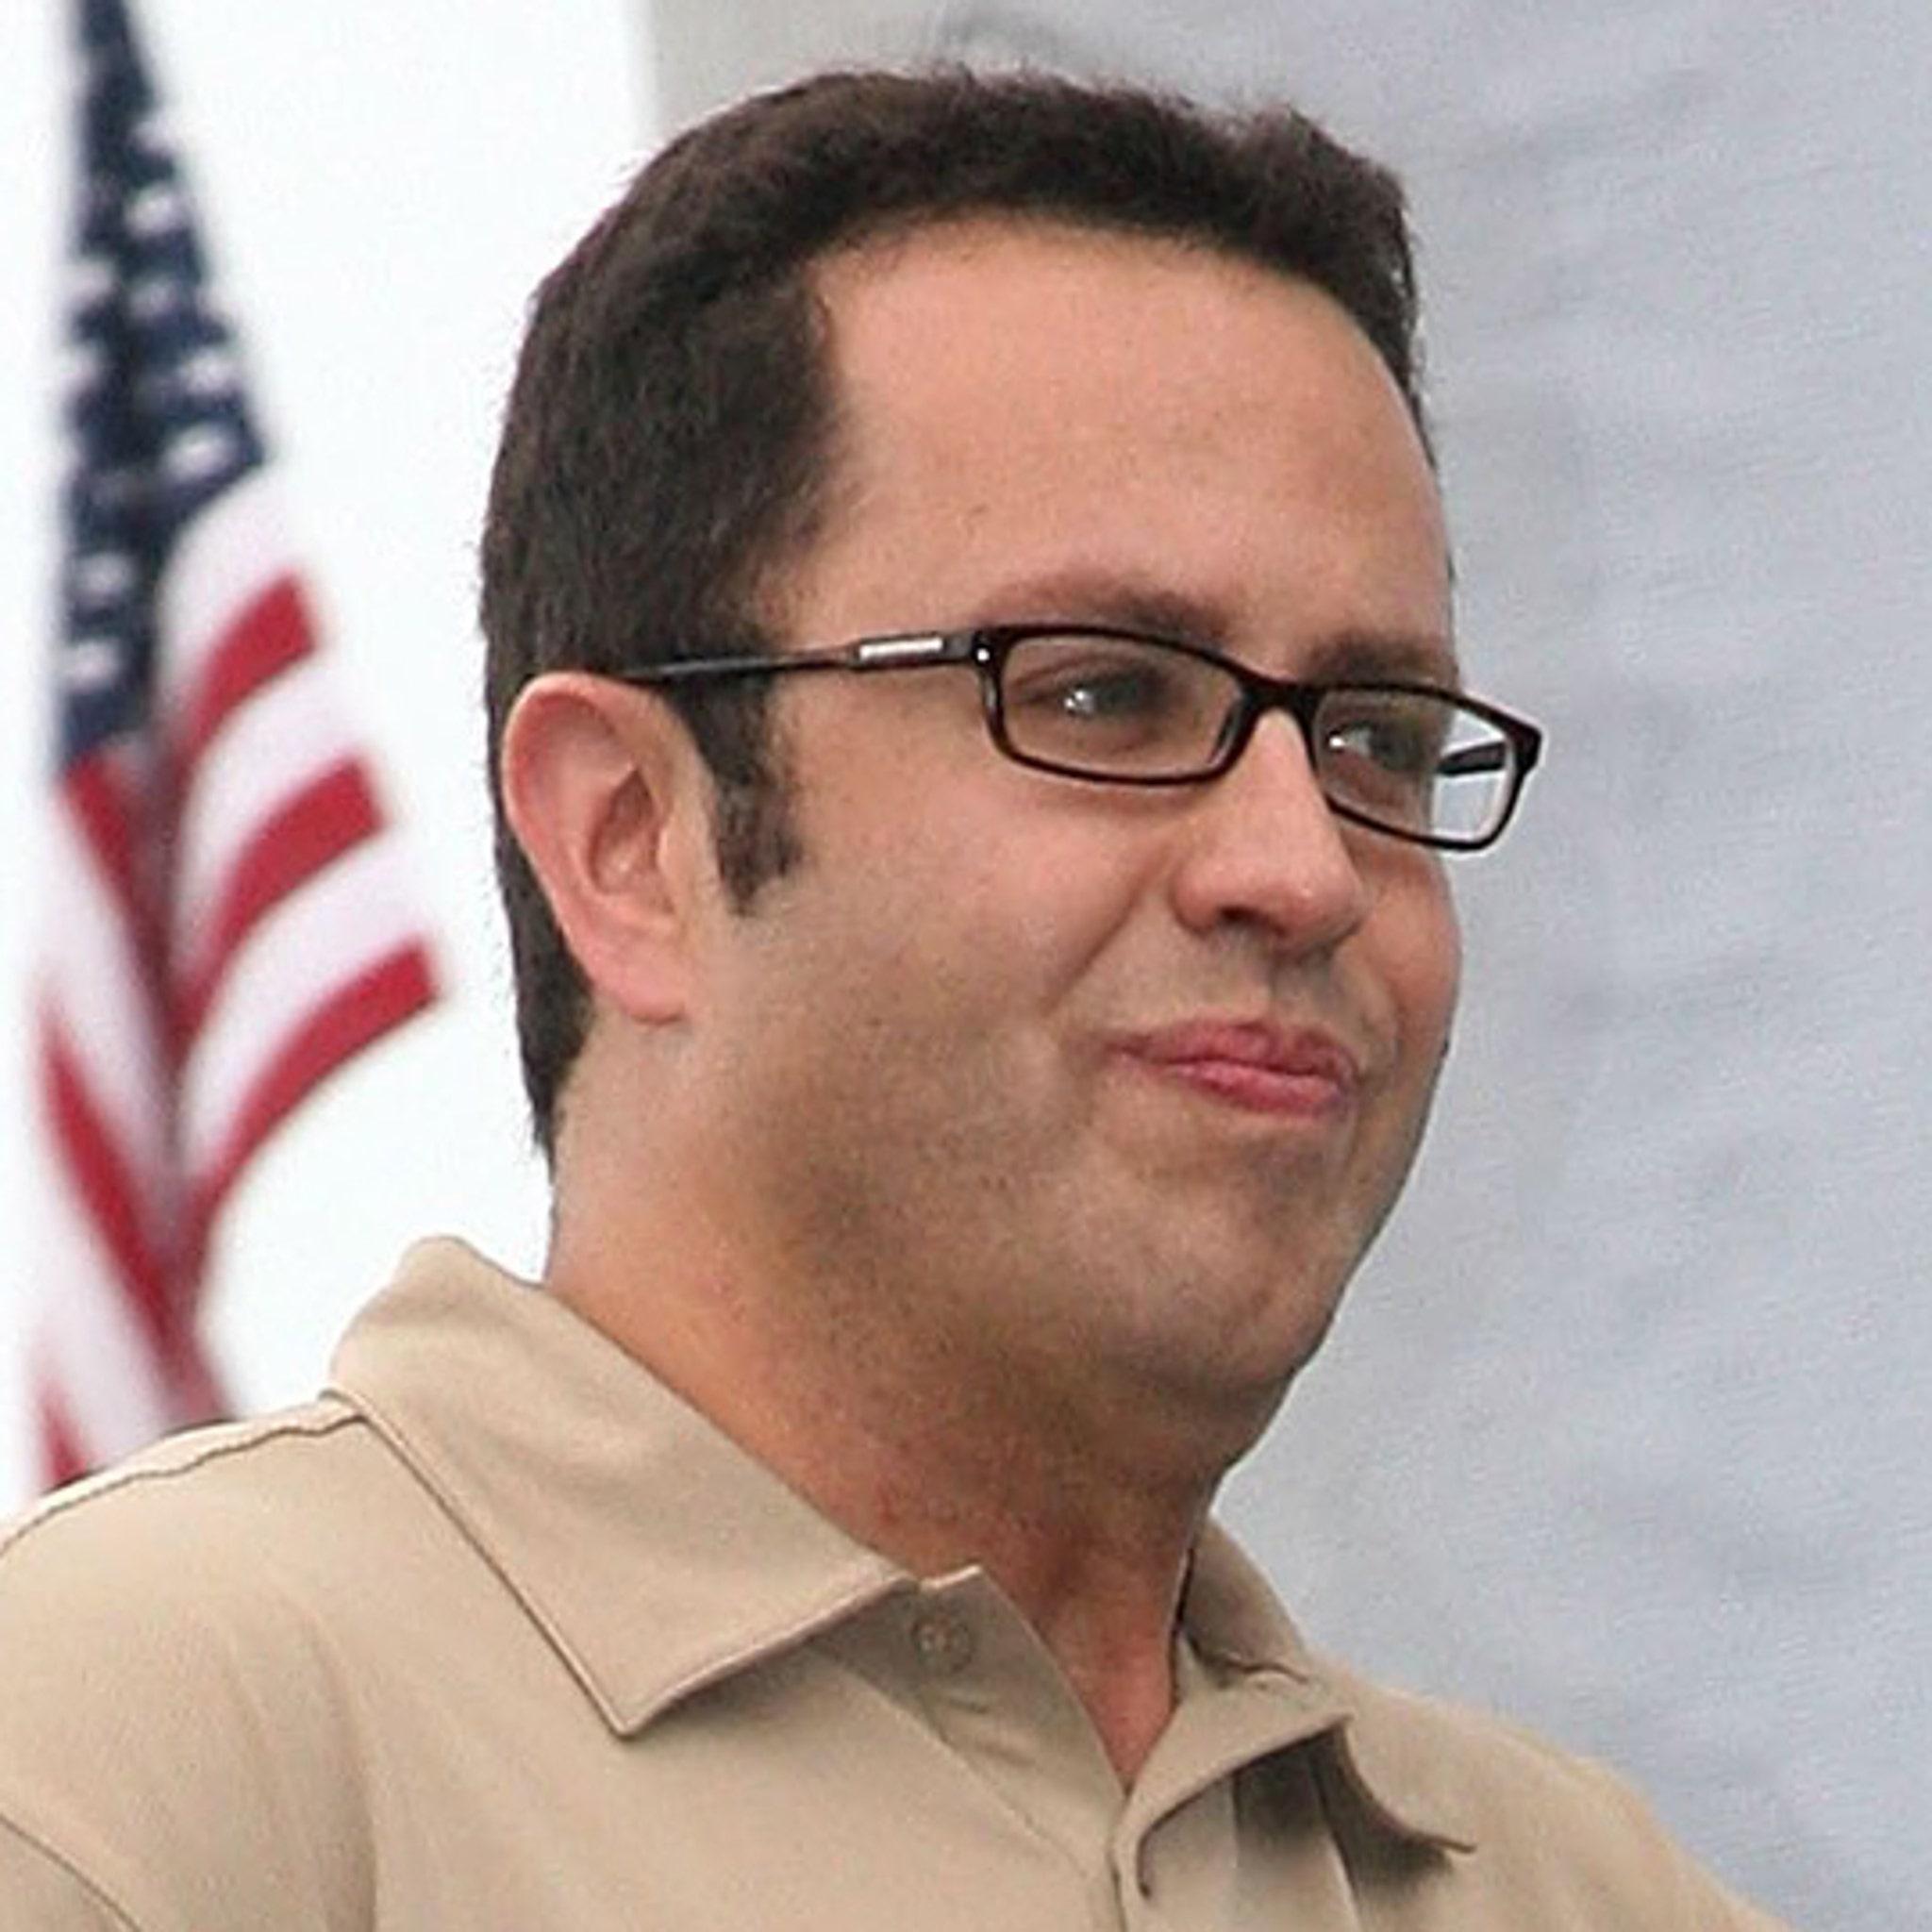 Jared Fogle Sues Parents of Child Porn Victim